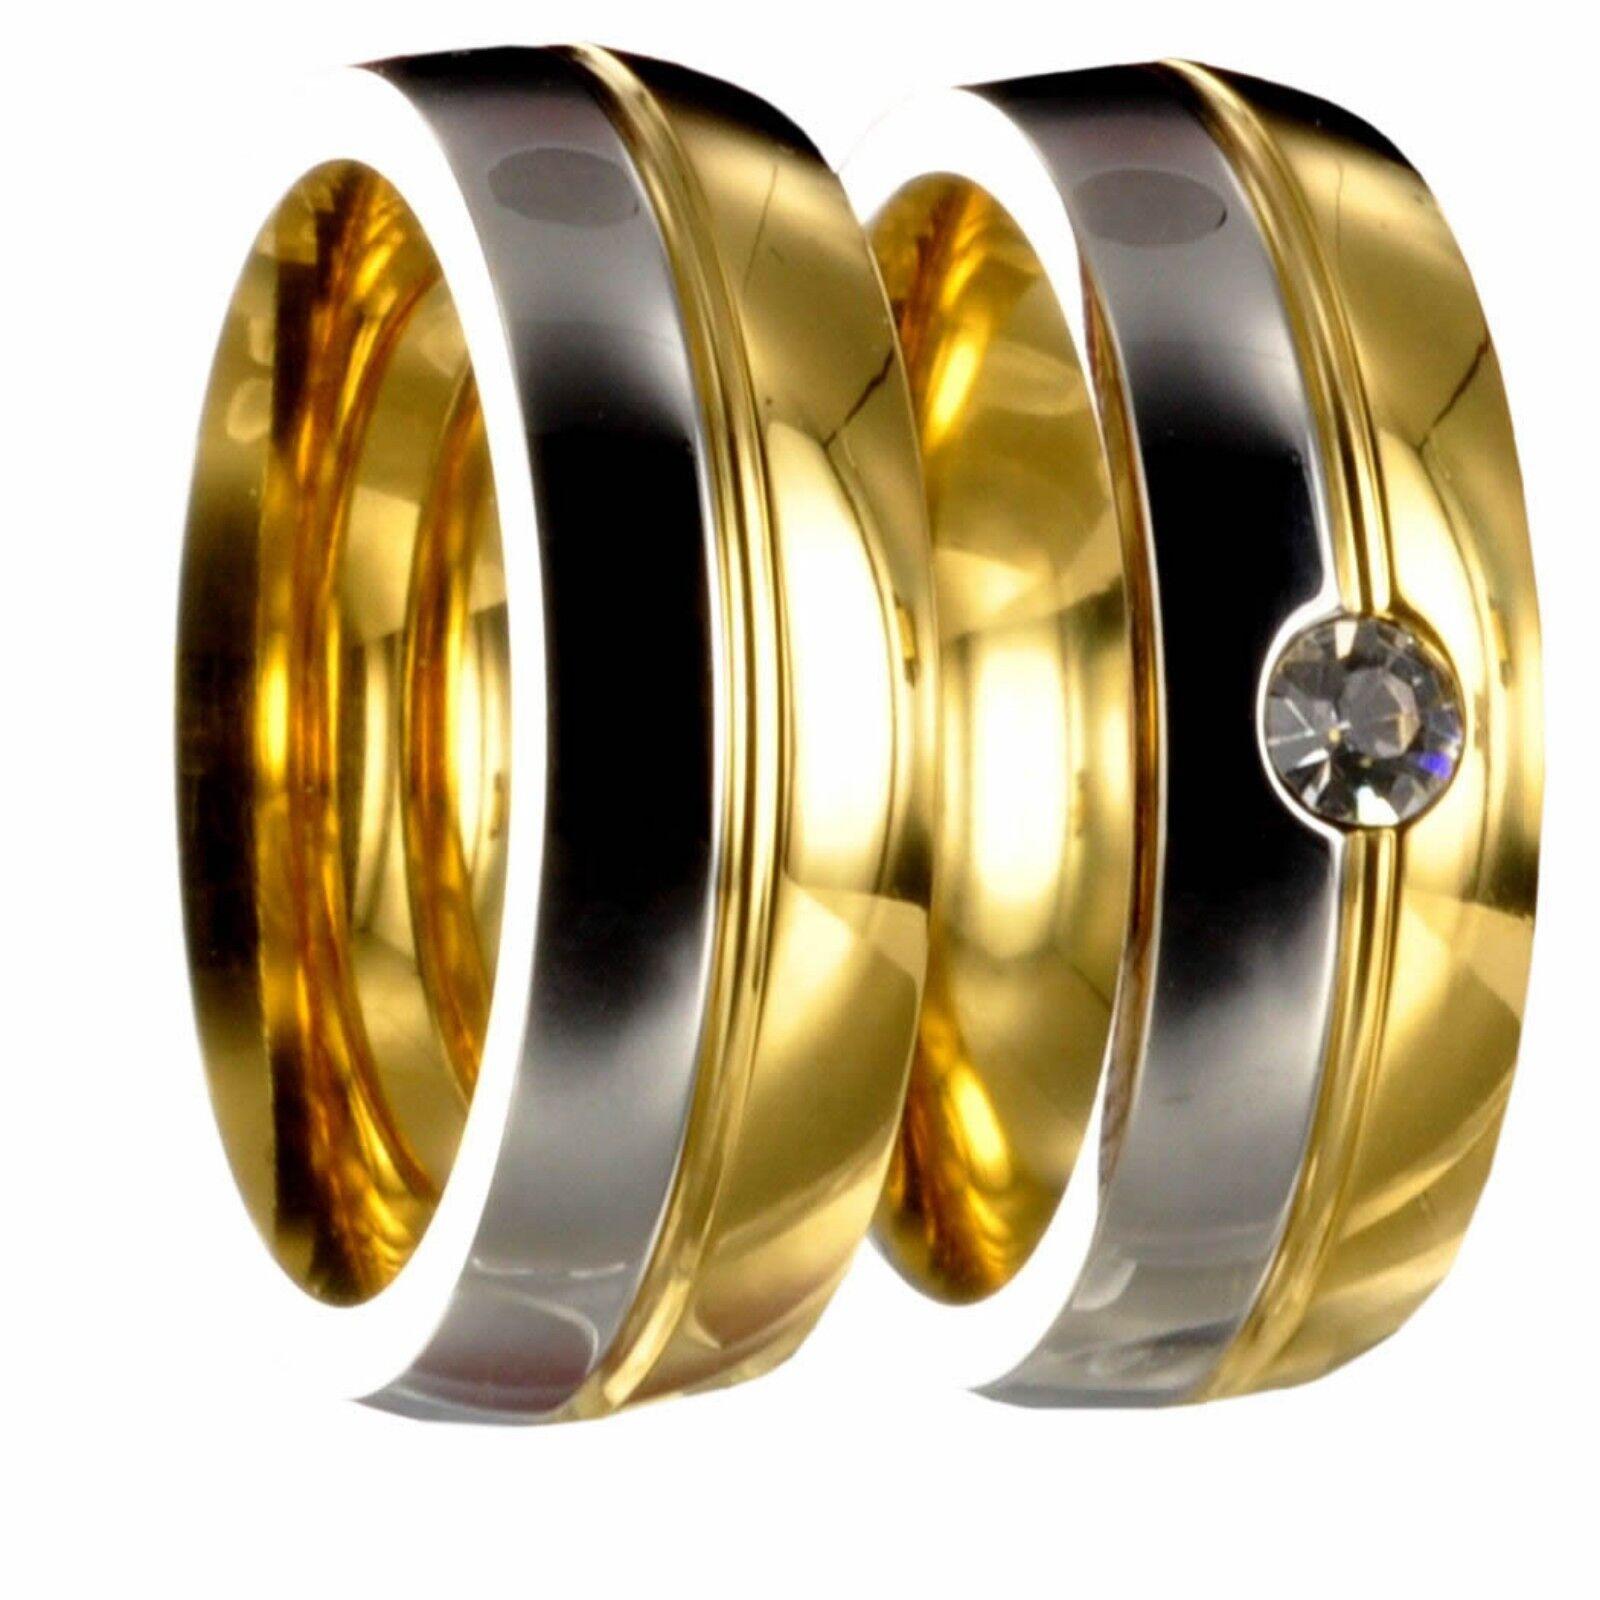 2 in acciaio inossidabile bicolore oro argentoo argentoo argentoo fedi fedi nuziali vere + incisione 40176 b2e73c